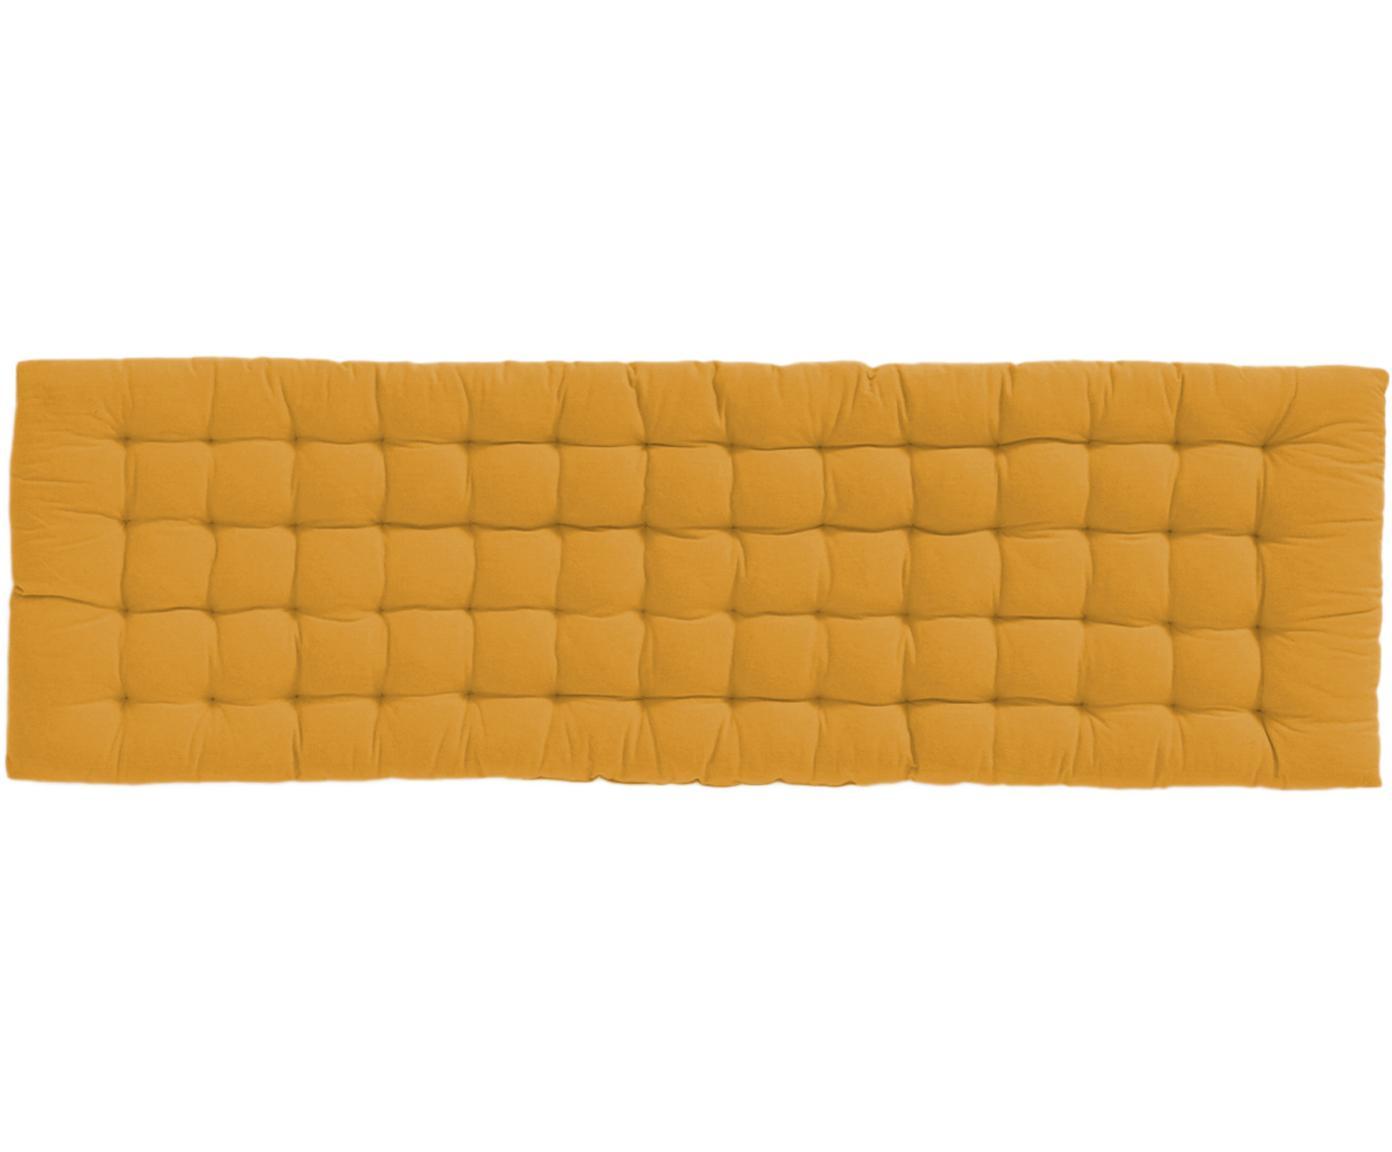 Bankauflage Gavema, Senfgelb, 40 x 120 cm